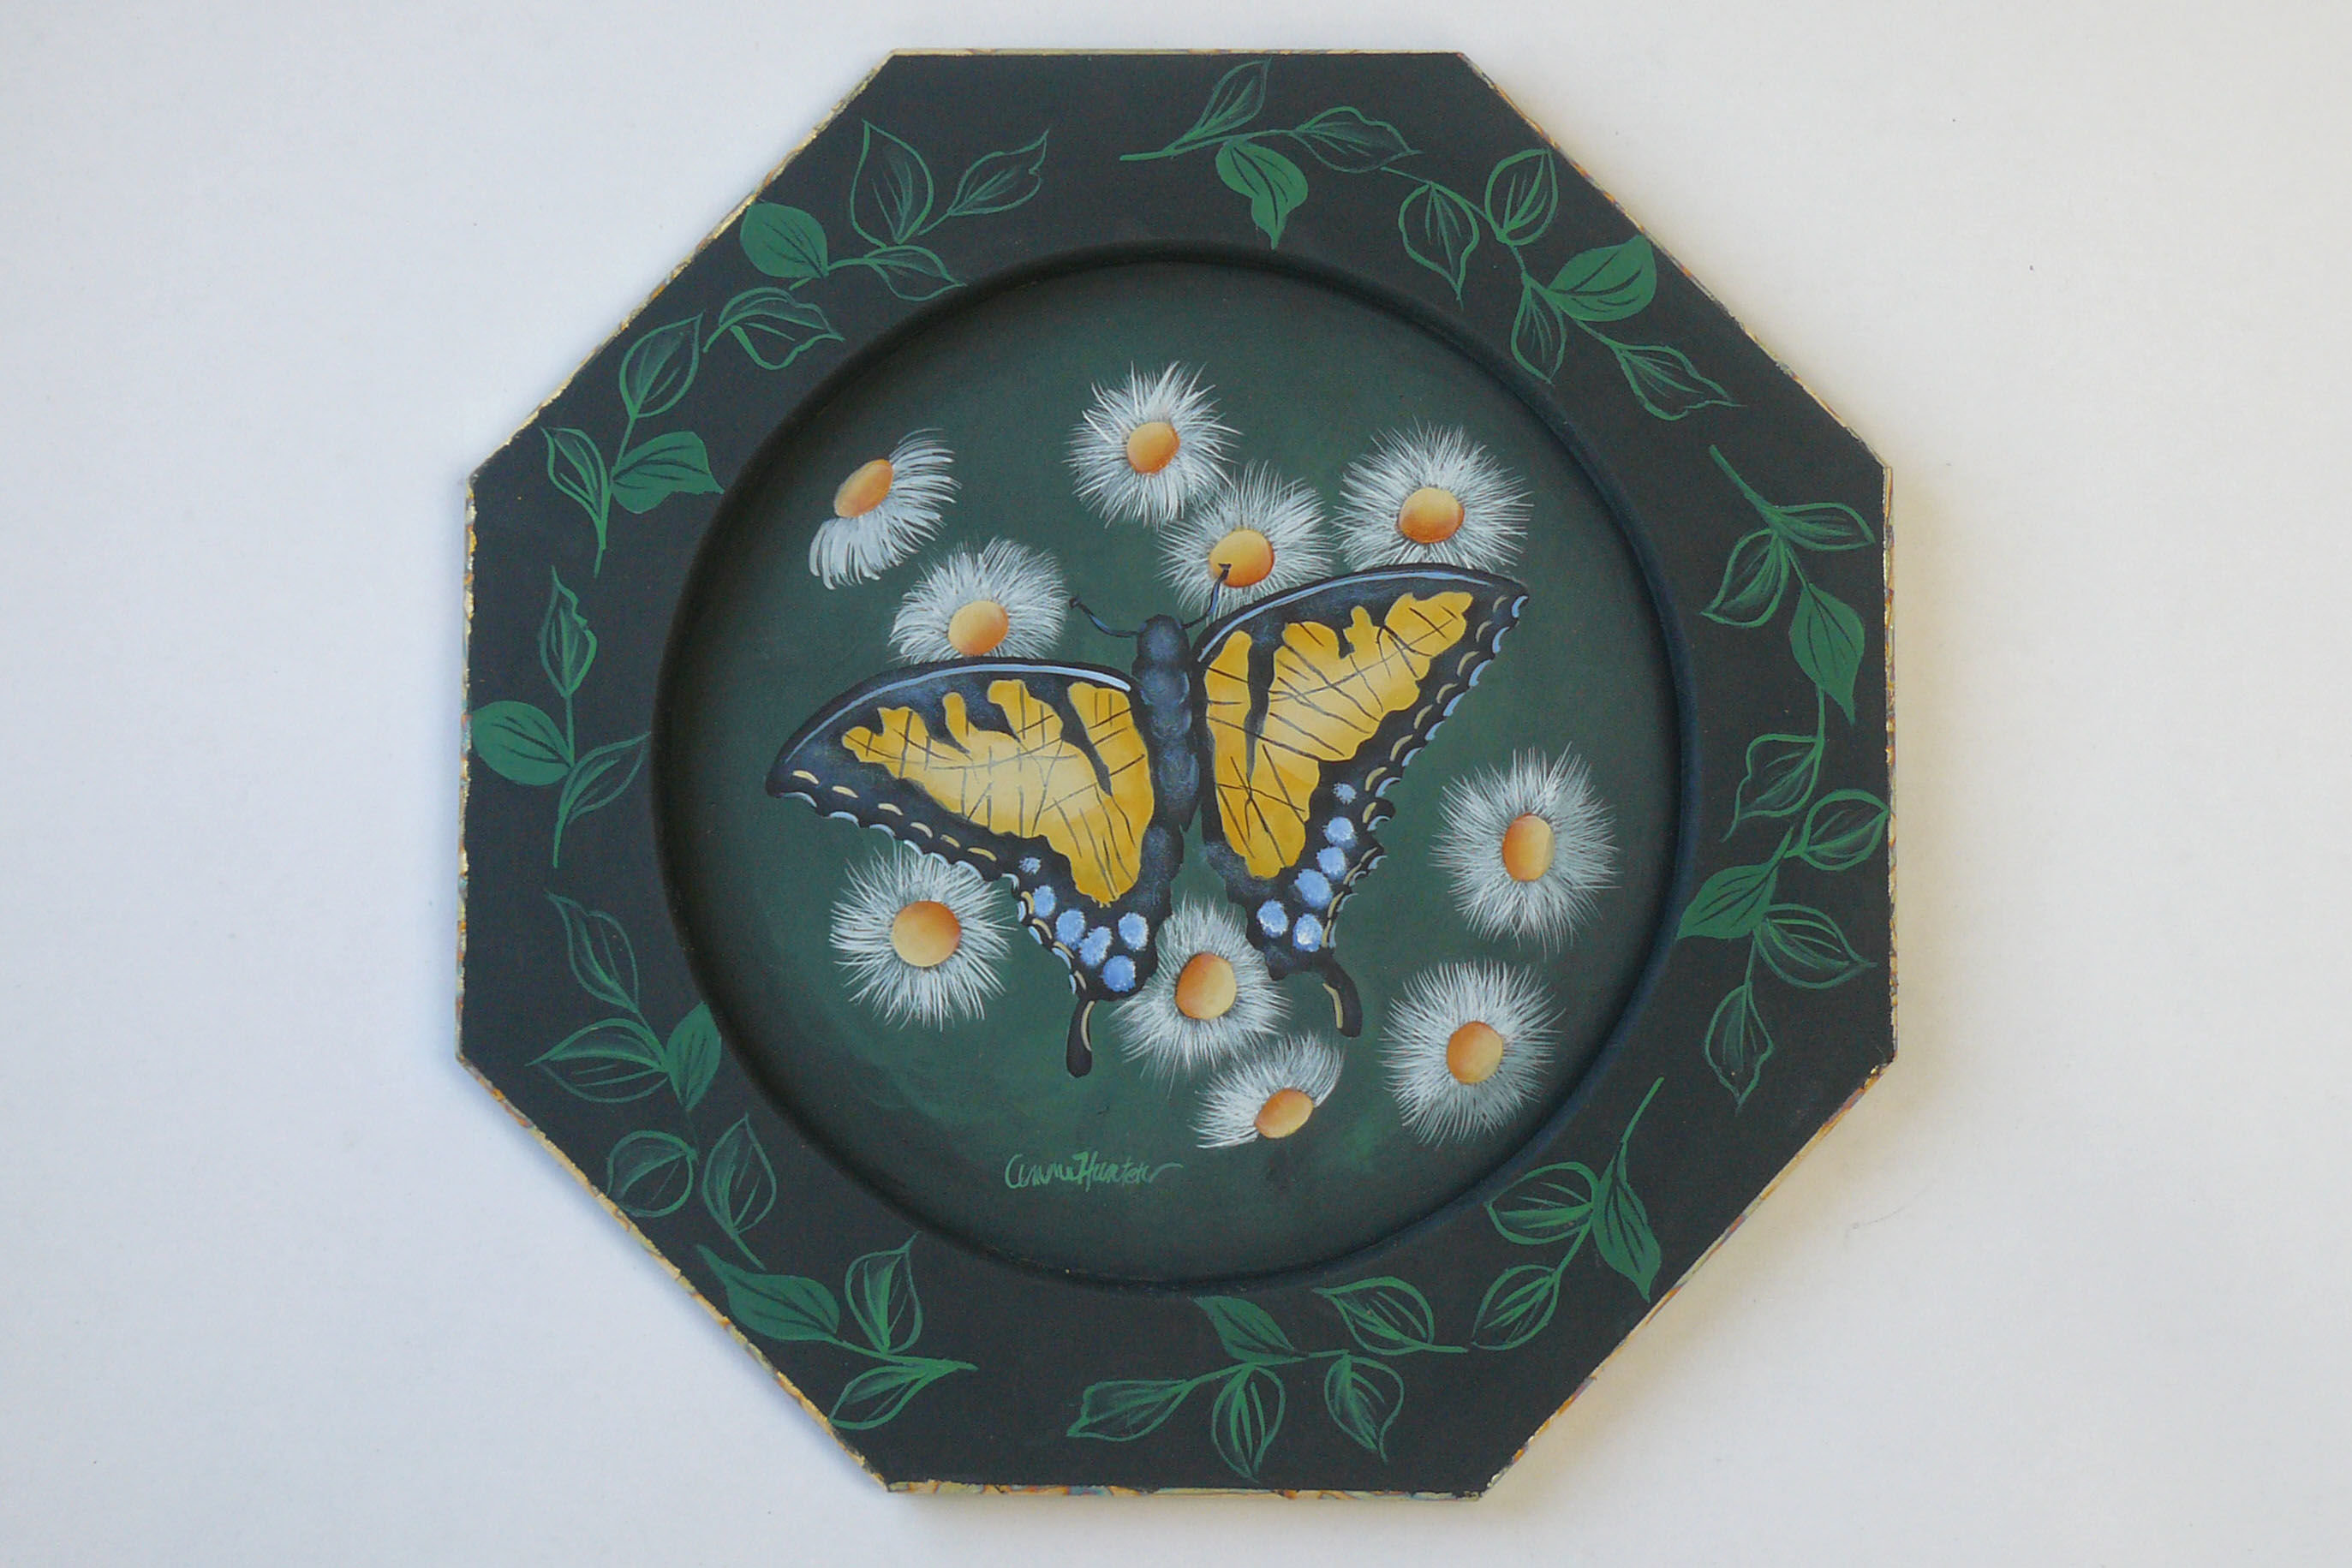 plate-wood-octagon-1923016-anne-hunter.jpg